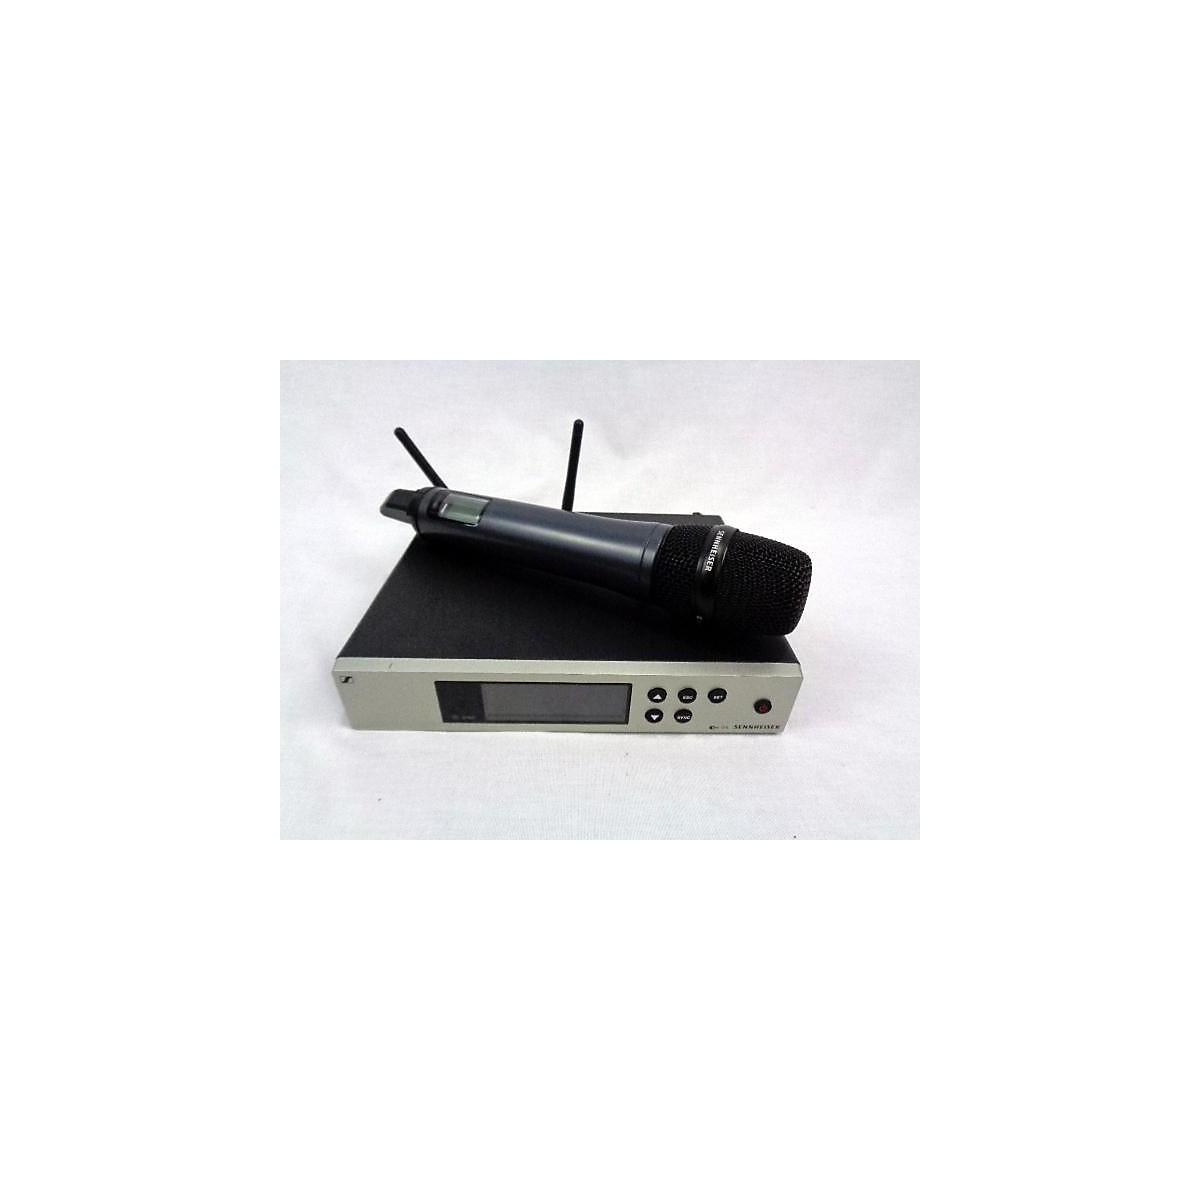 Sennheiser Em 100 G4 Handheld Wireless System